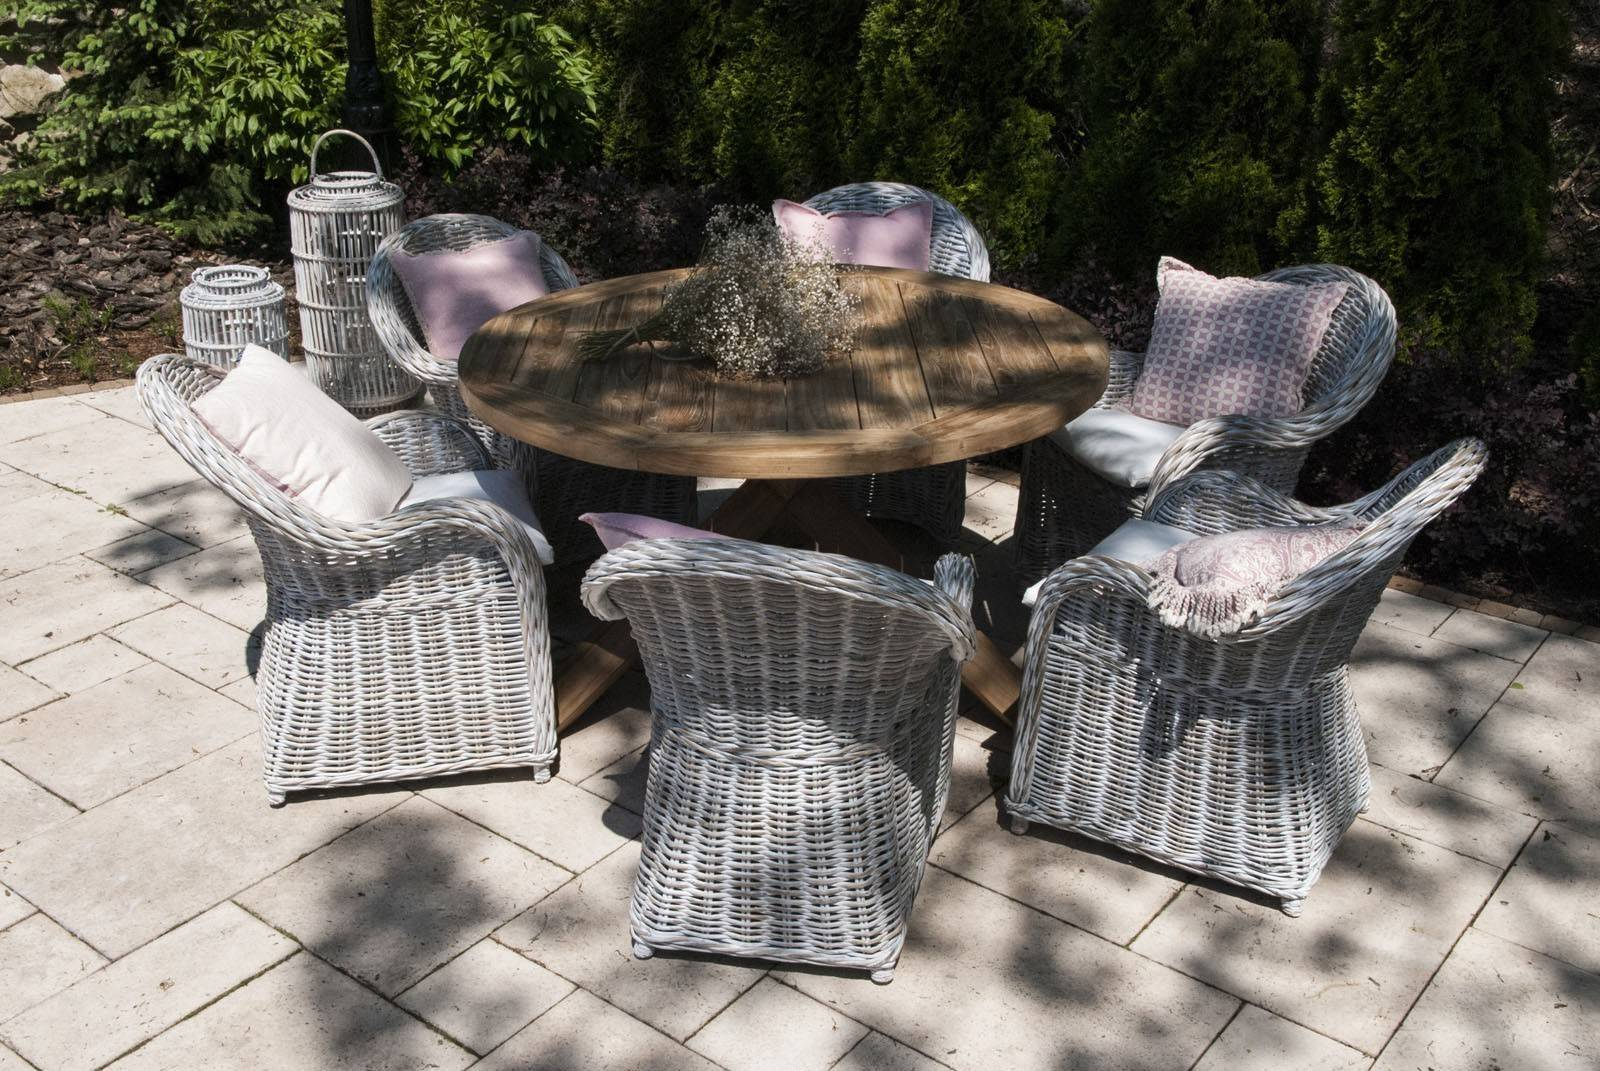 Záhradná teaková jedálenská súprava BORDEAUX VI